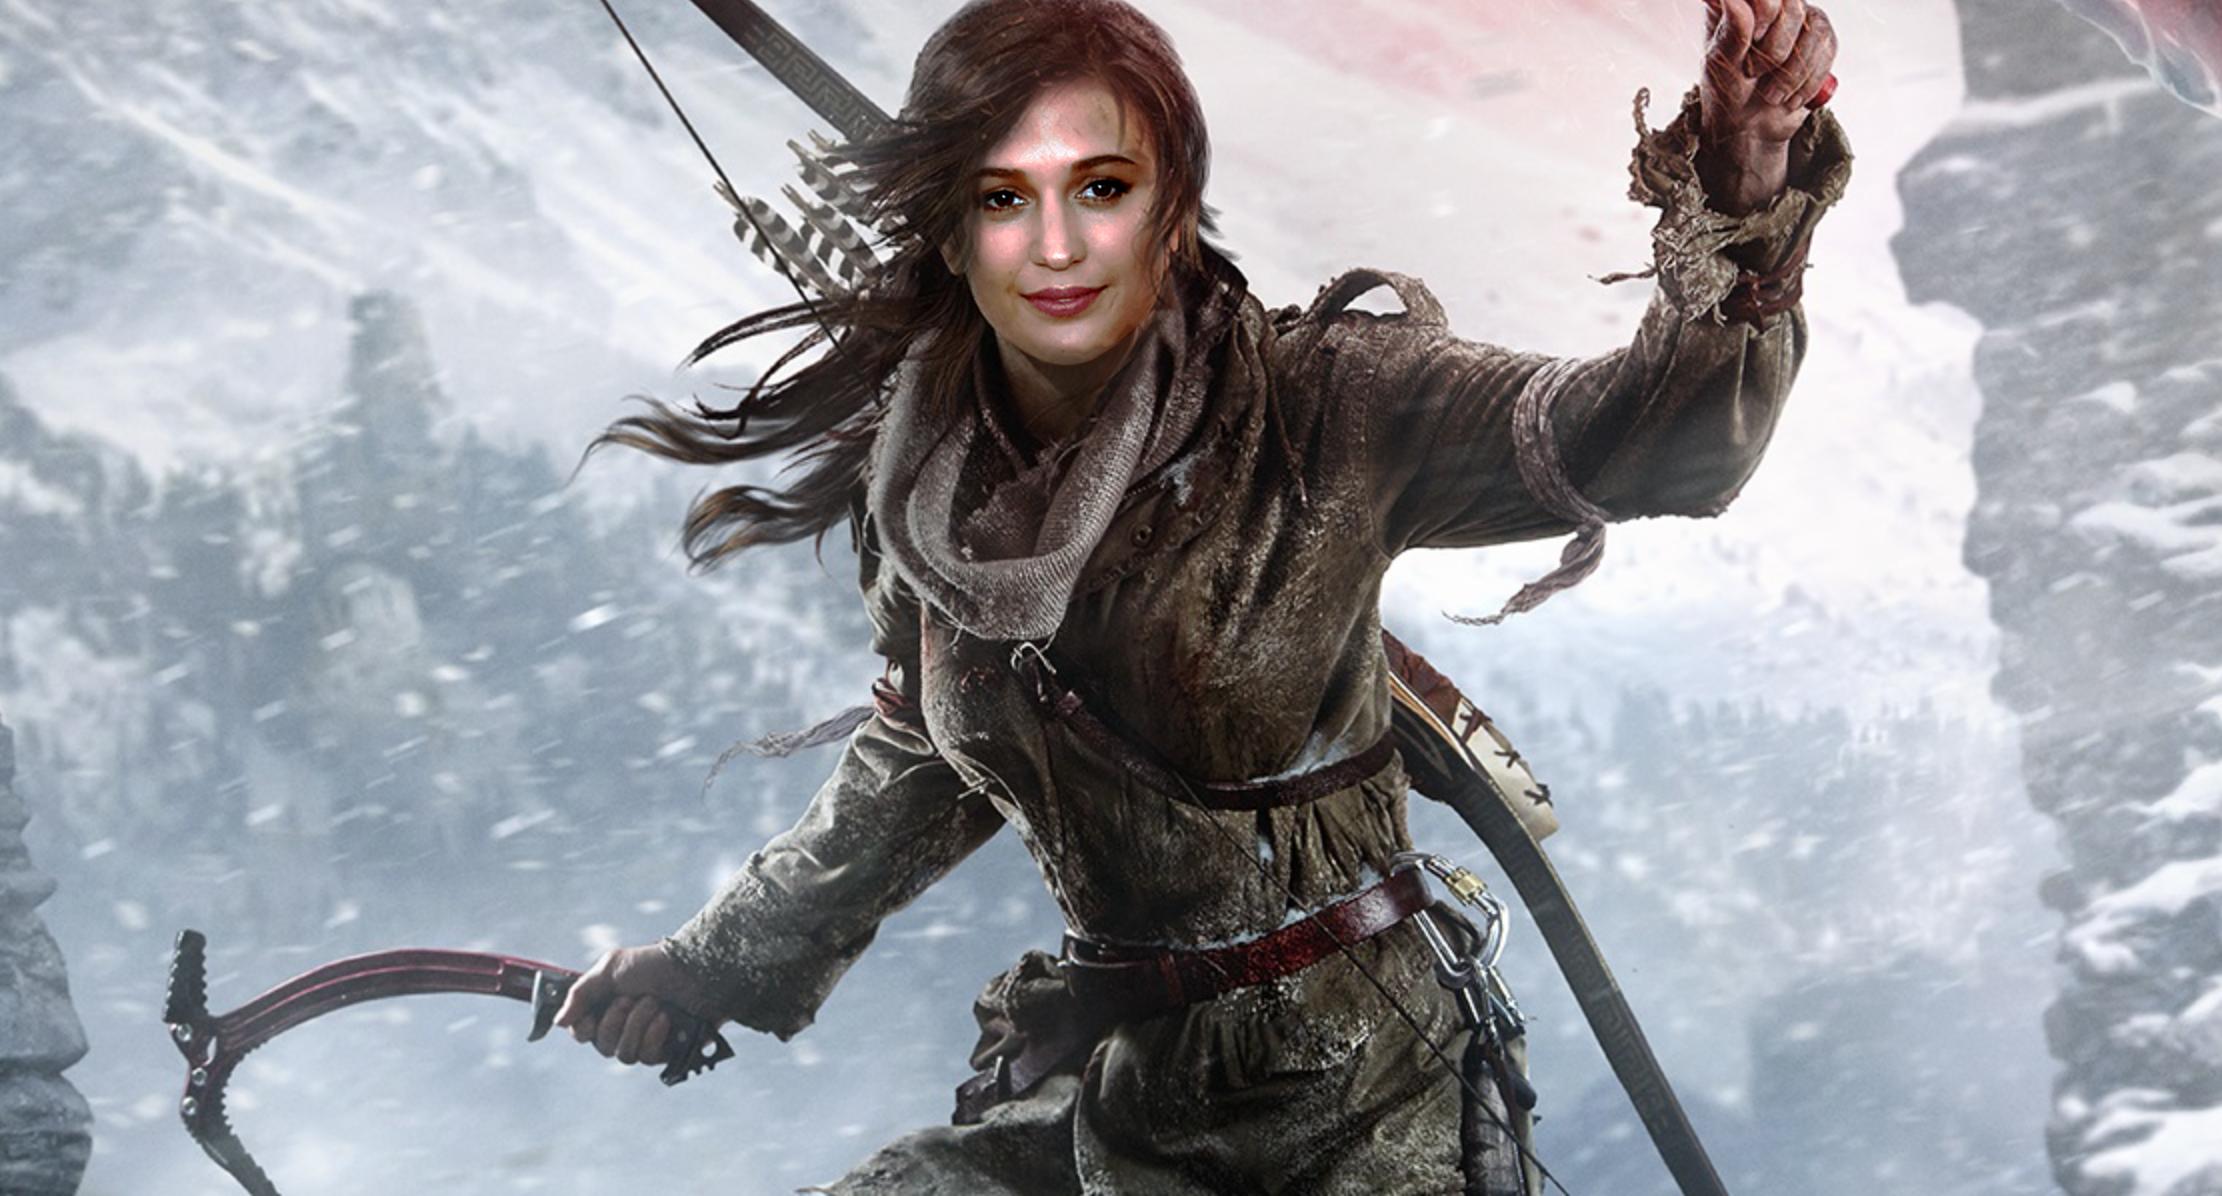 'Tomb Raider' Film Reboot Plot Details Unearthed